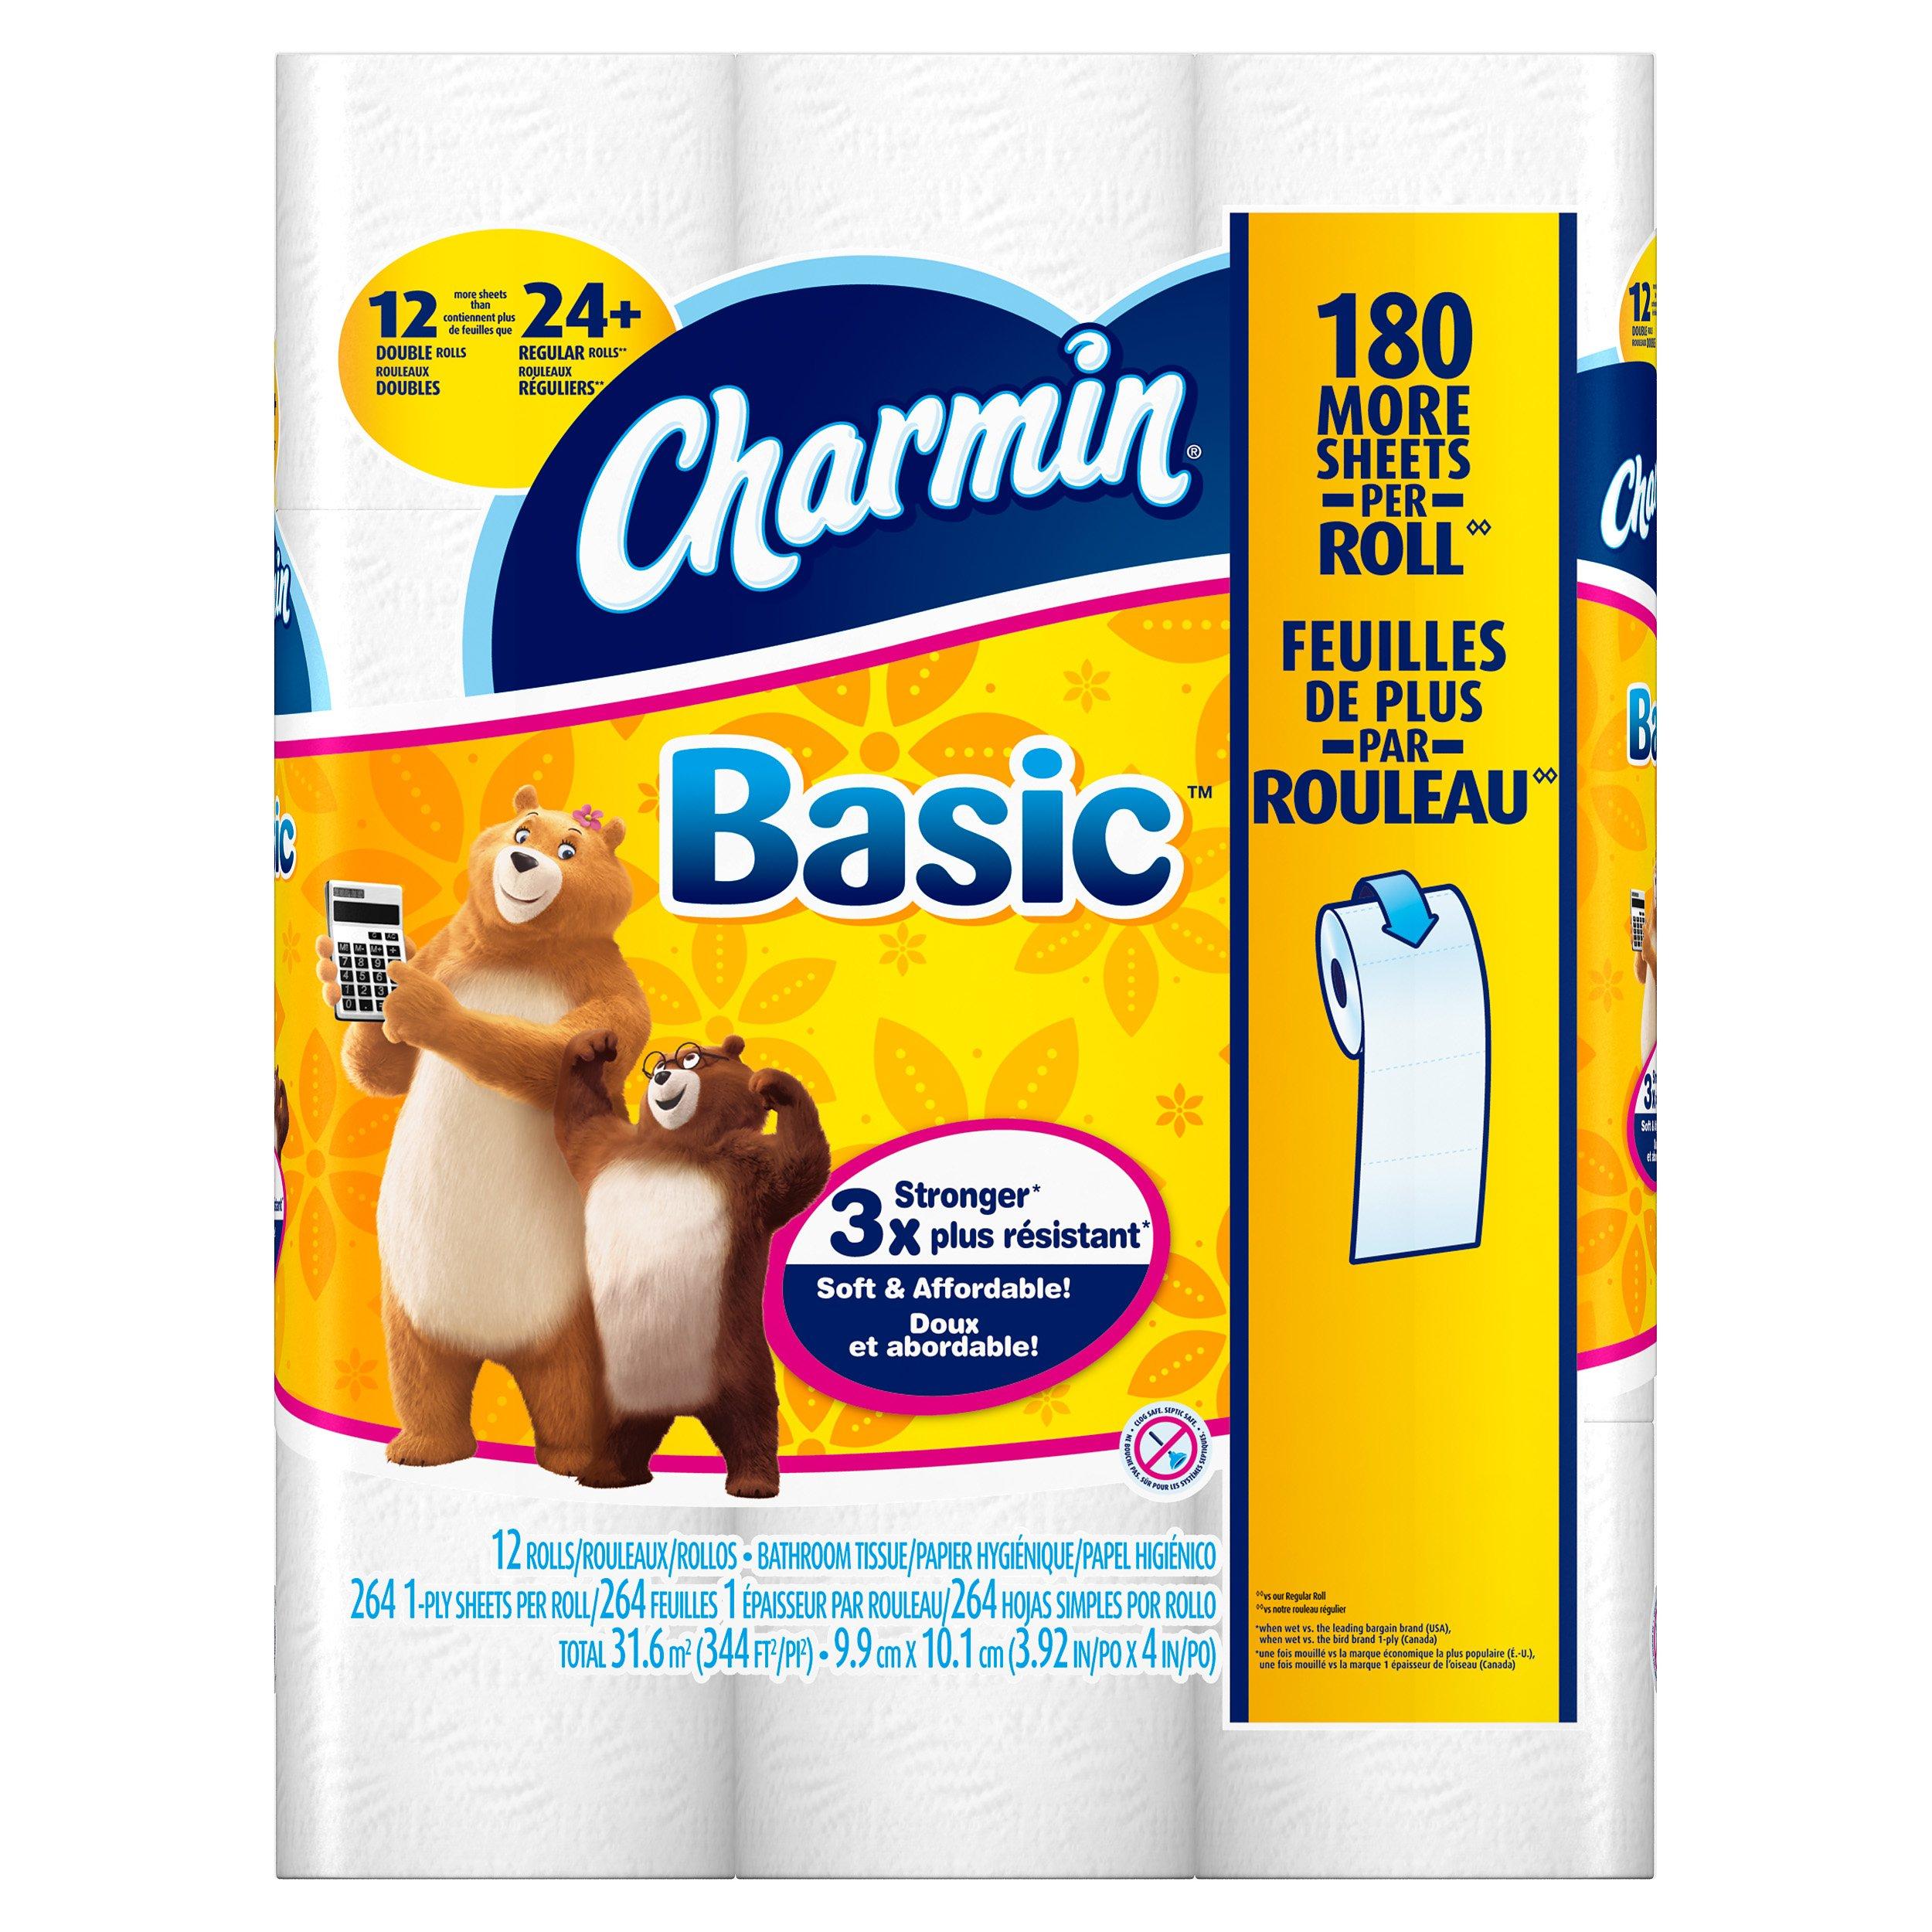 Charmin Toilet Paper, Basic Bath Tissue, Double Roll Toilet Paper, 48 Count